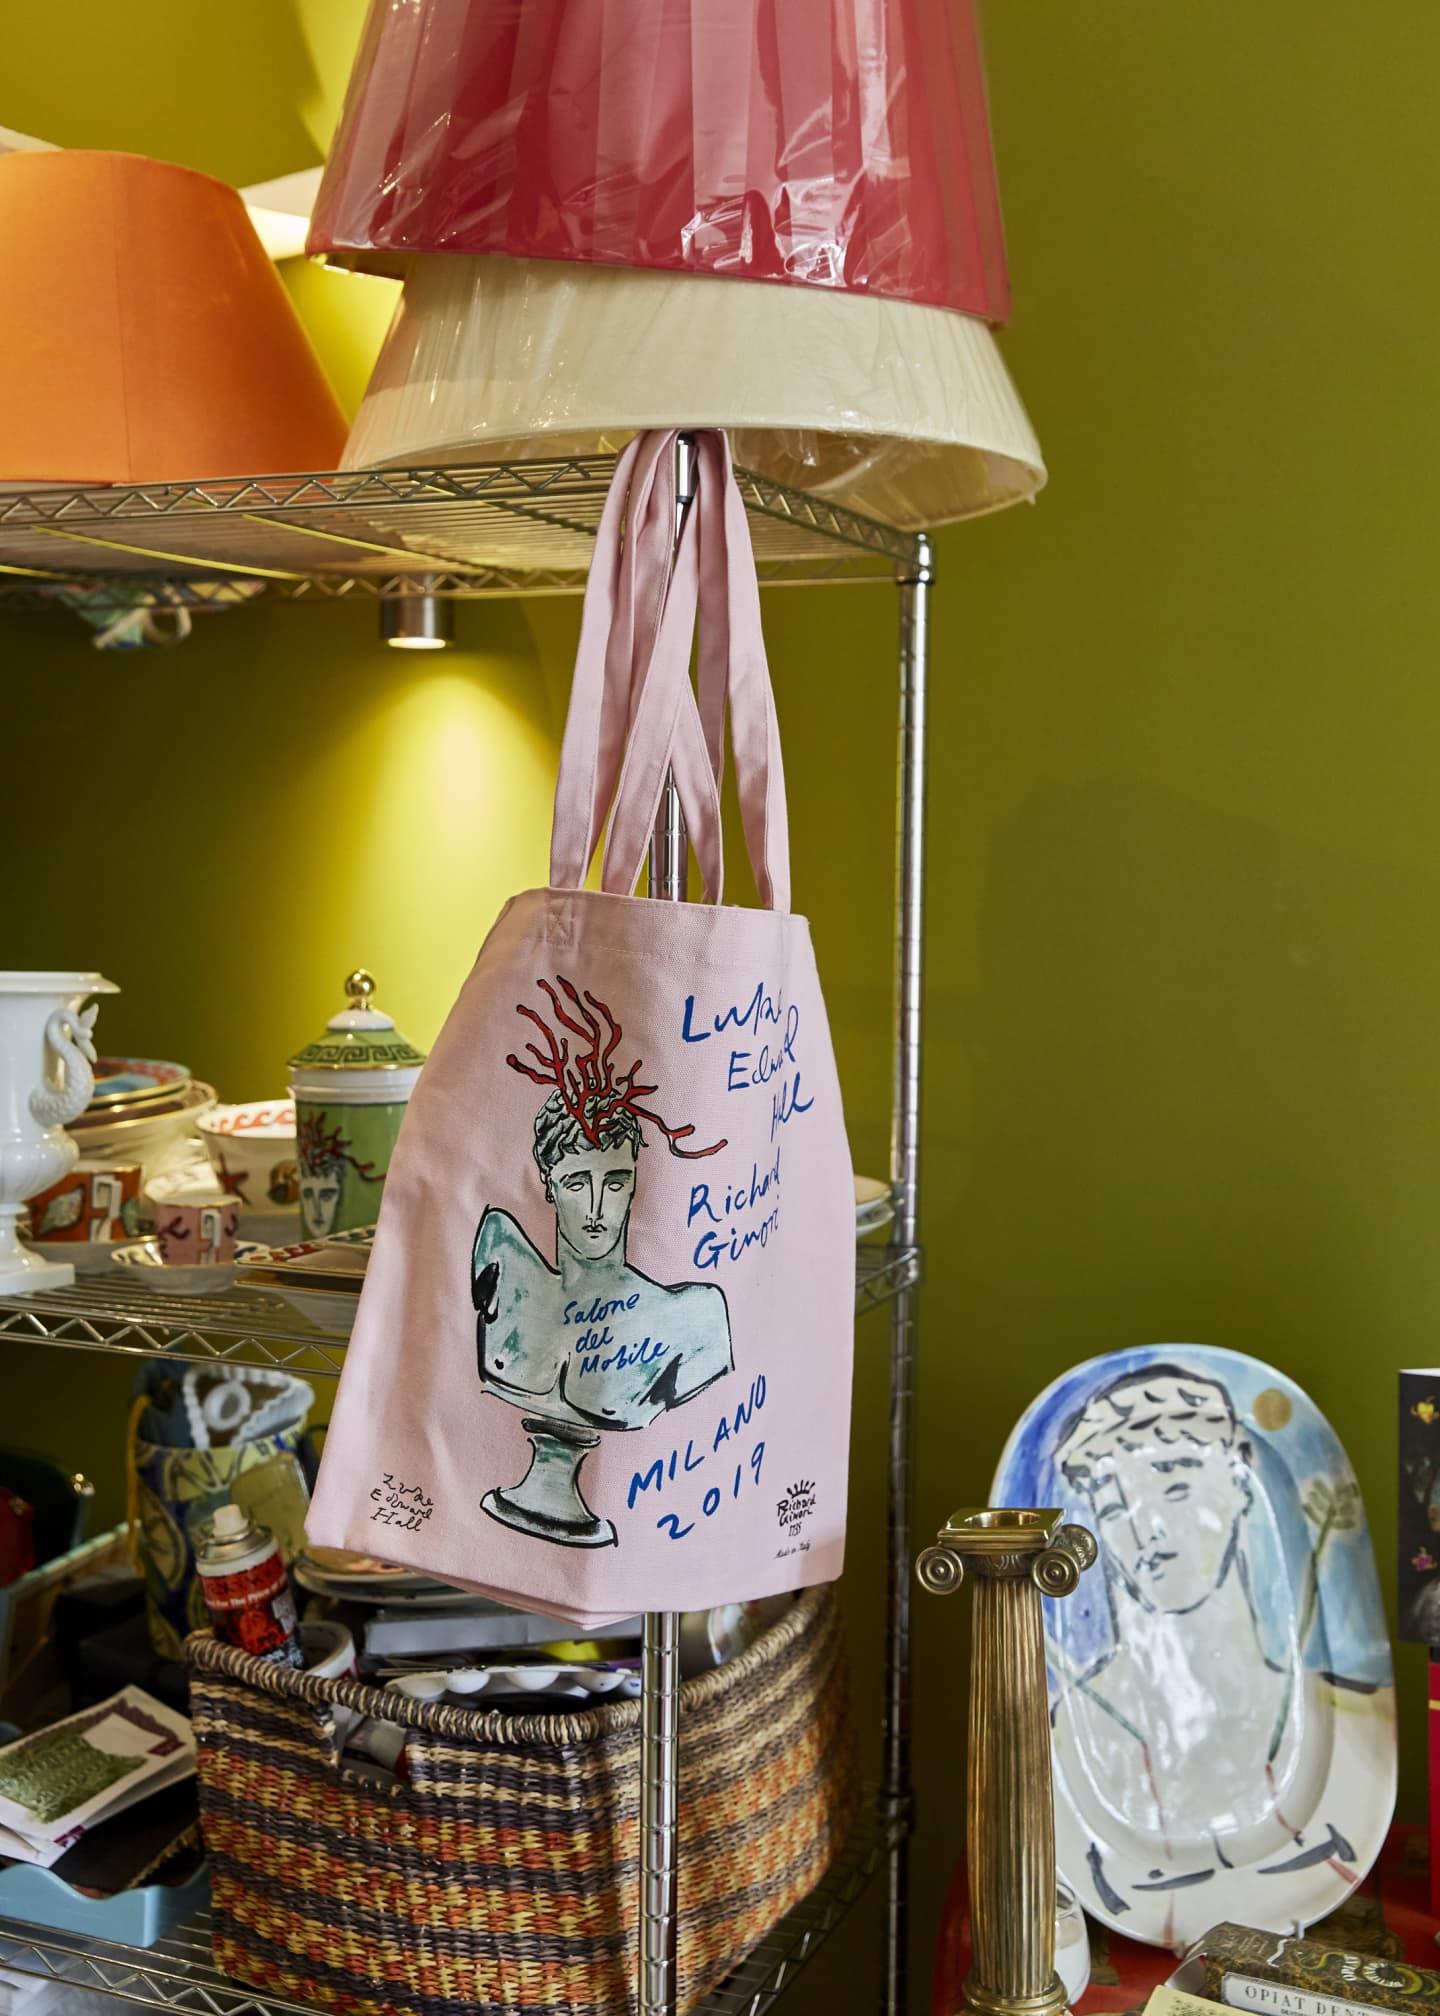 hung painted bag